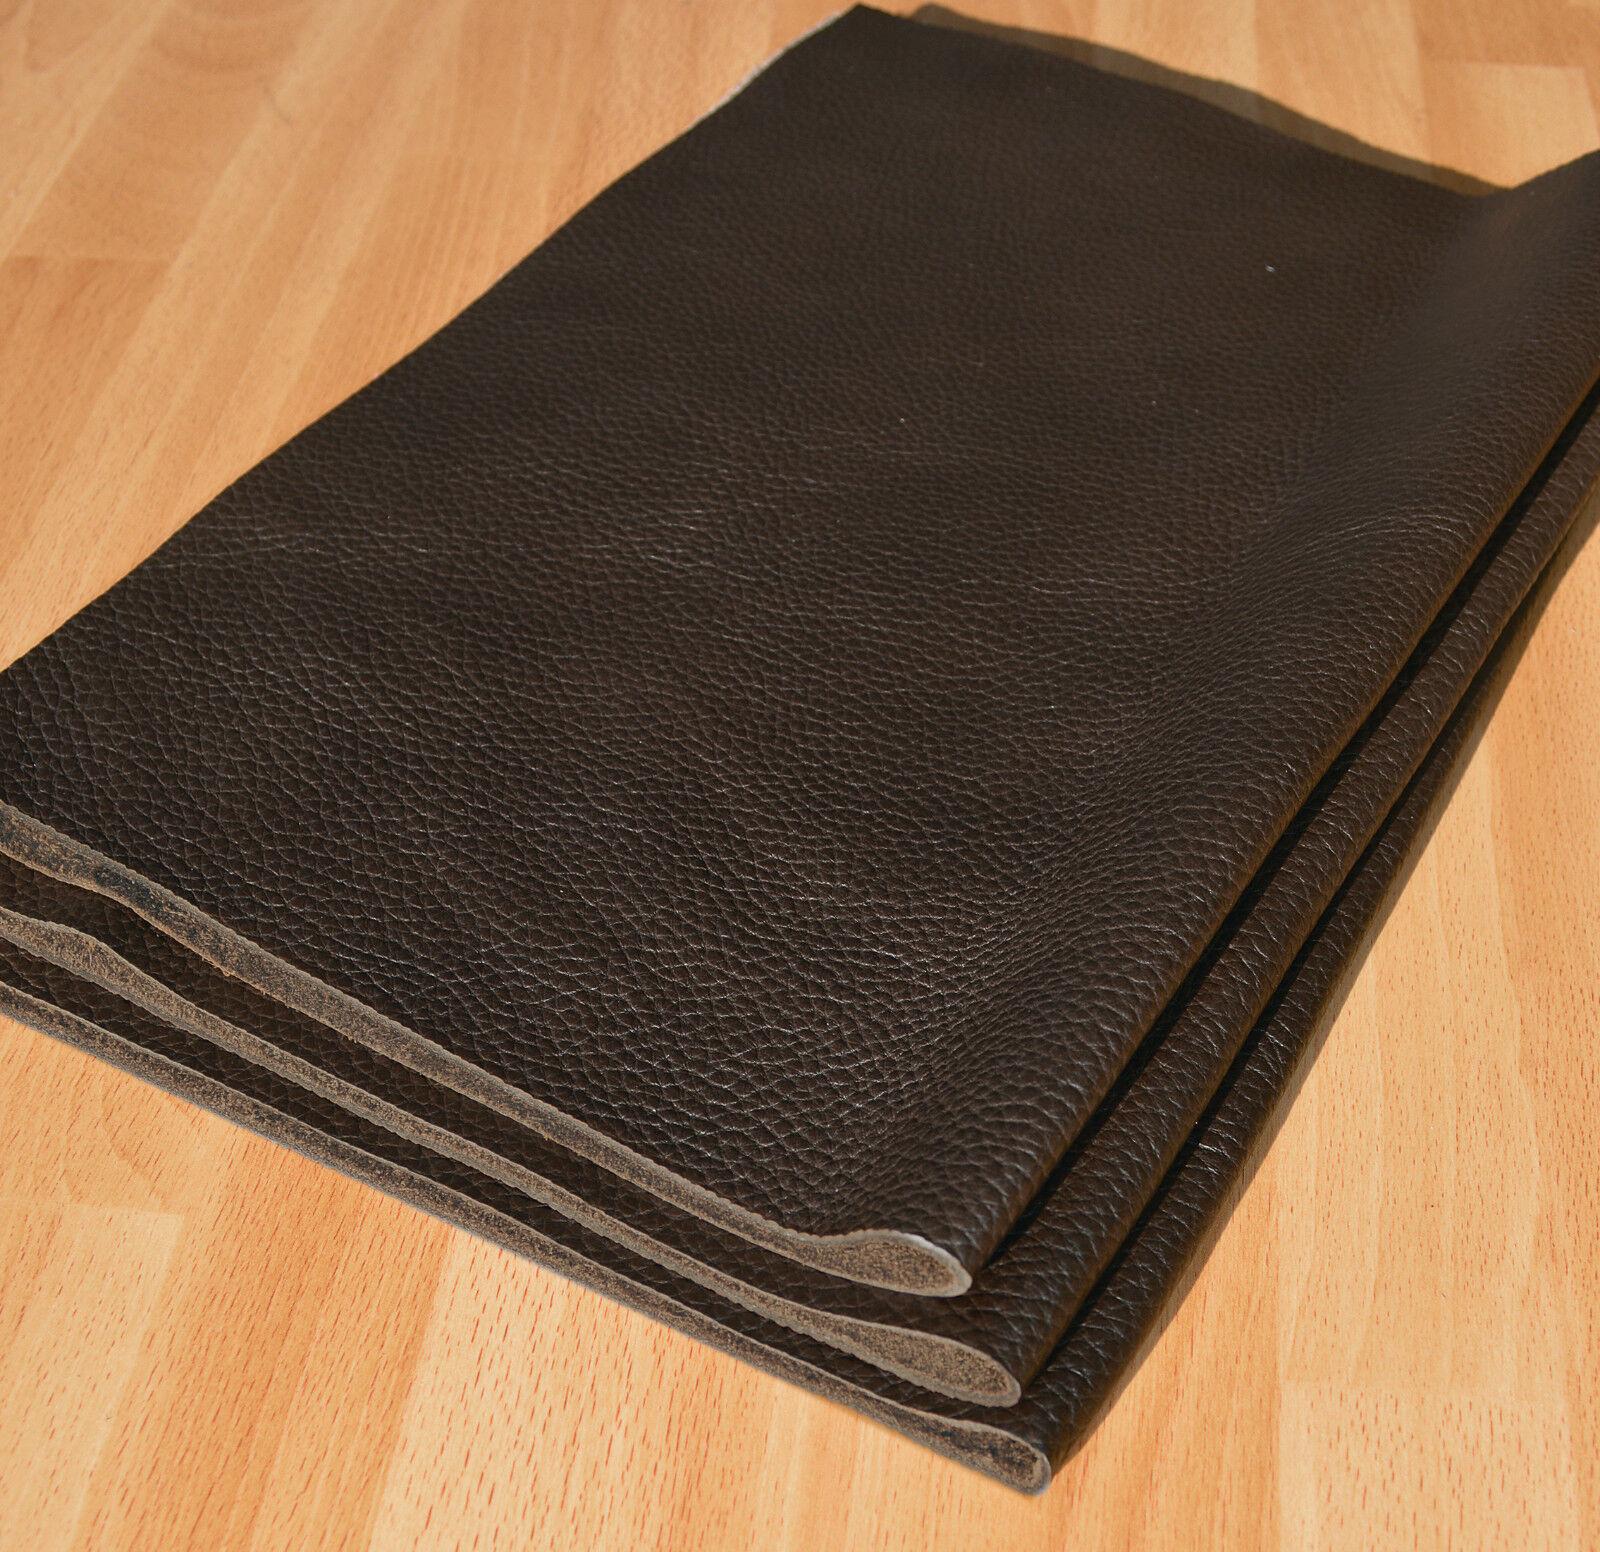 Leder Lederstück, Lederzuschnitt keine Lederreste, DIN-A4/-A3, dkl. Braun Mocca